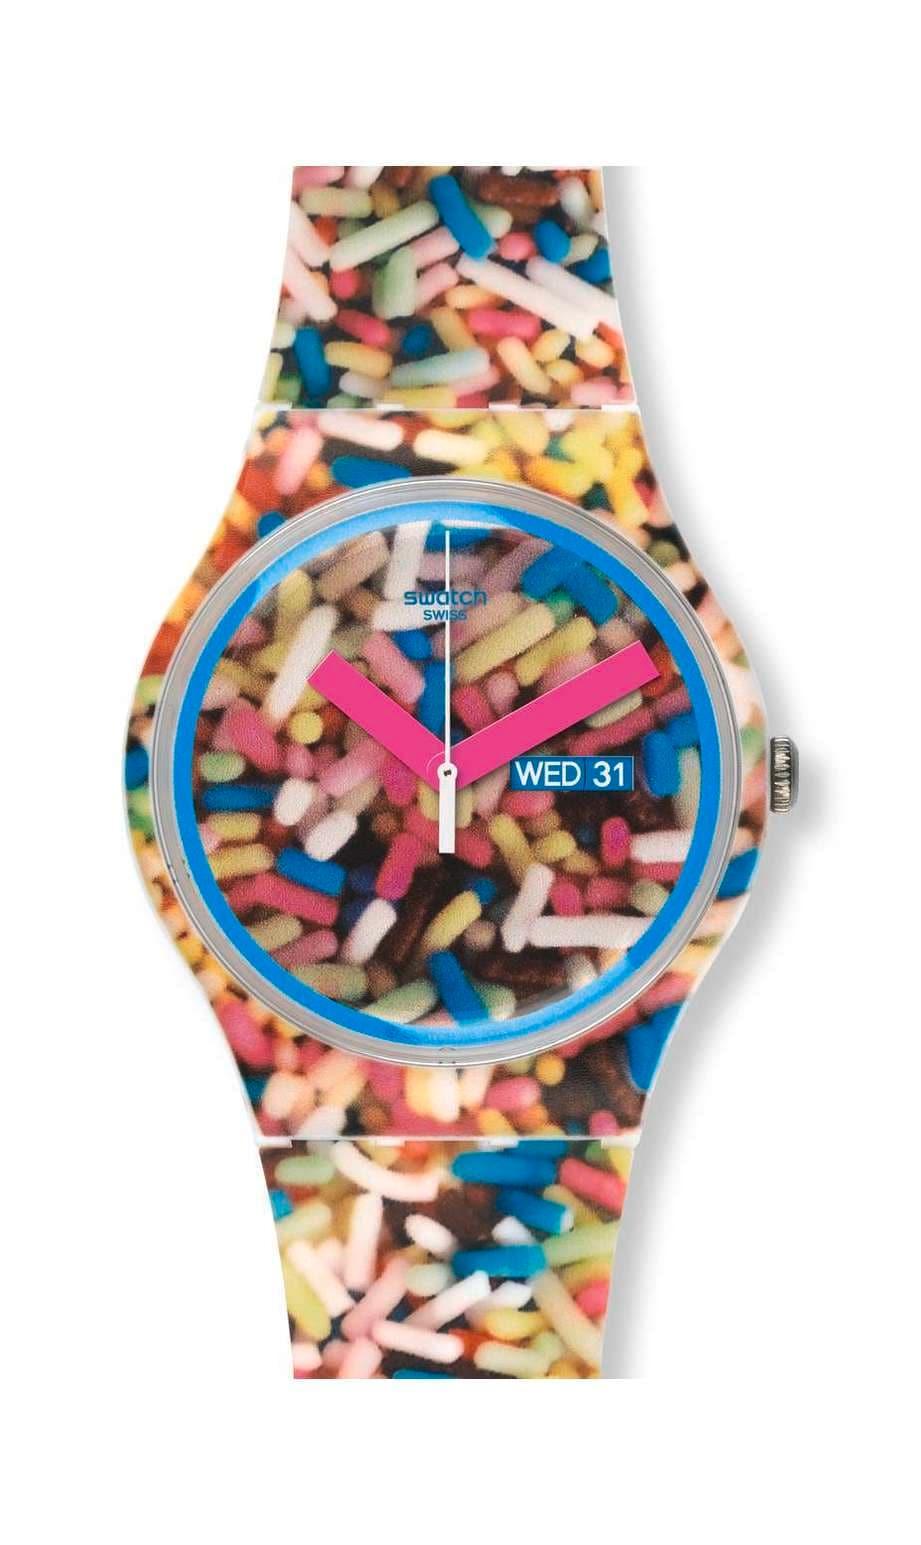 Swatch - SPRINKLED - 1